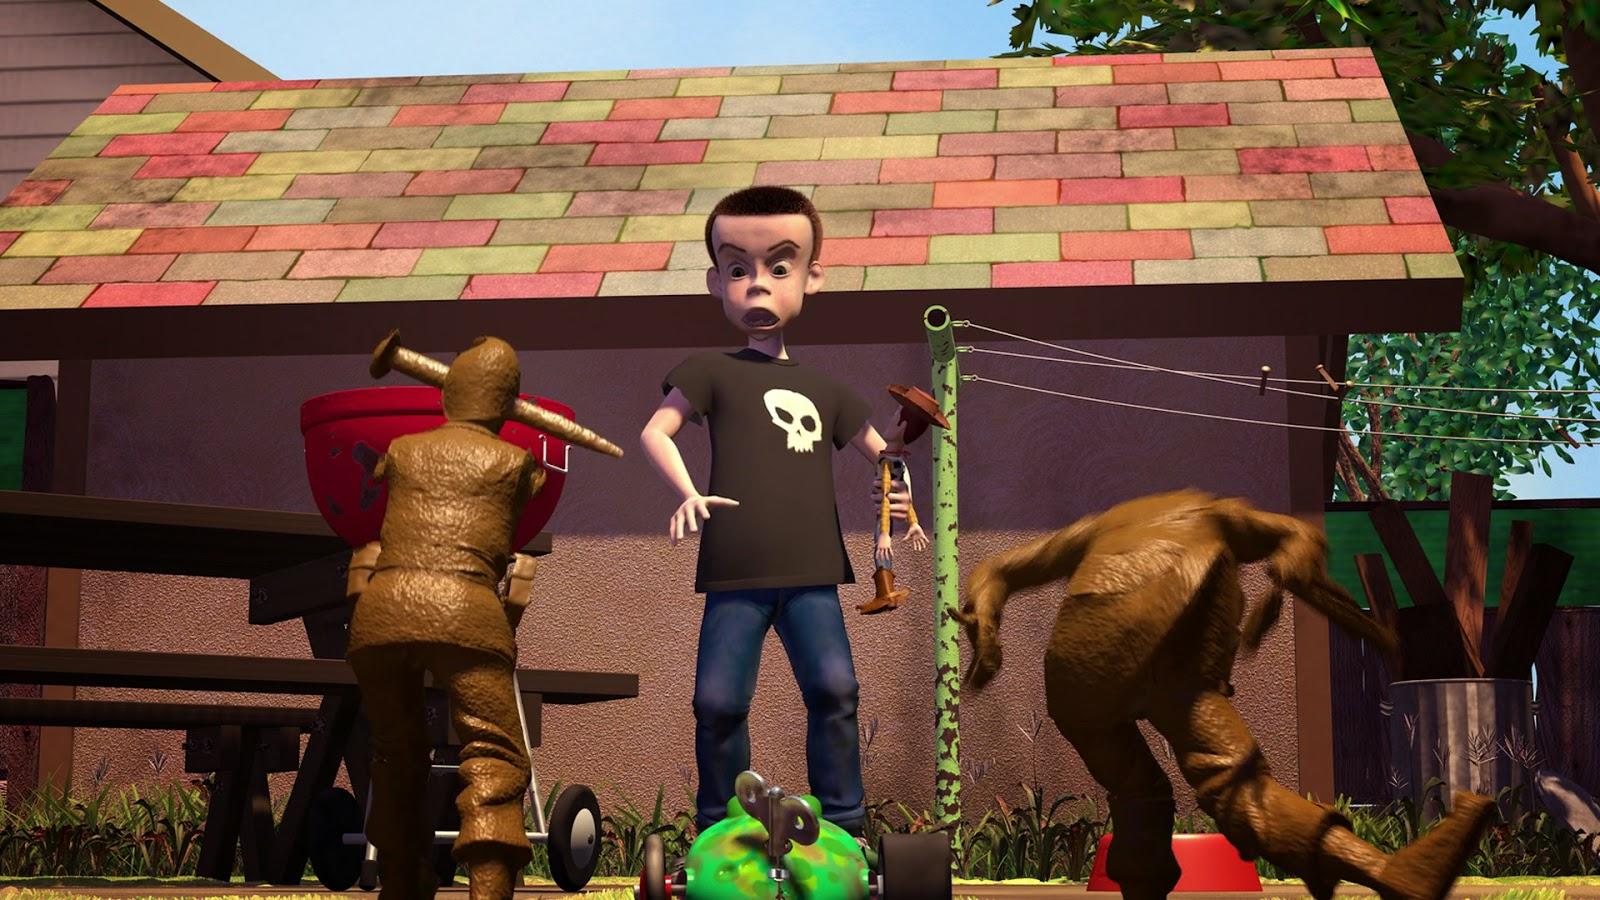 Pixar and Beyond: 10 Horrifying Pixar Movie Moments